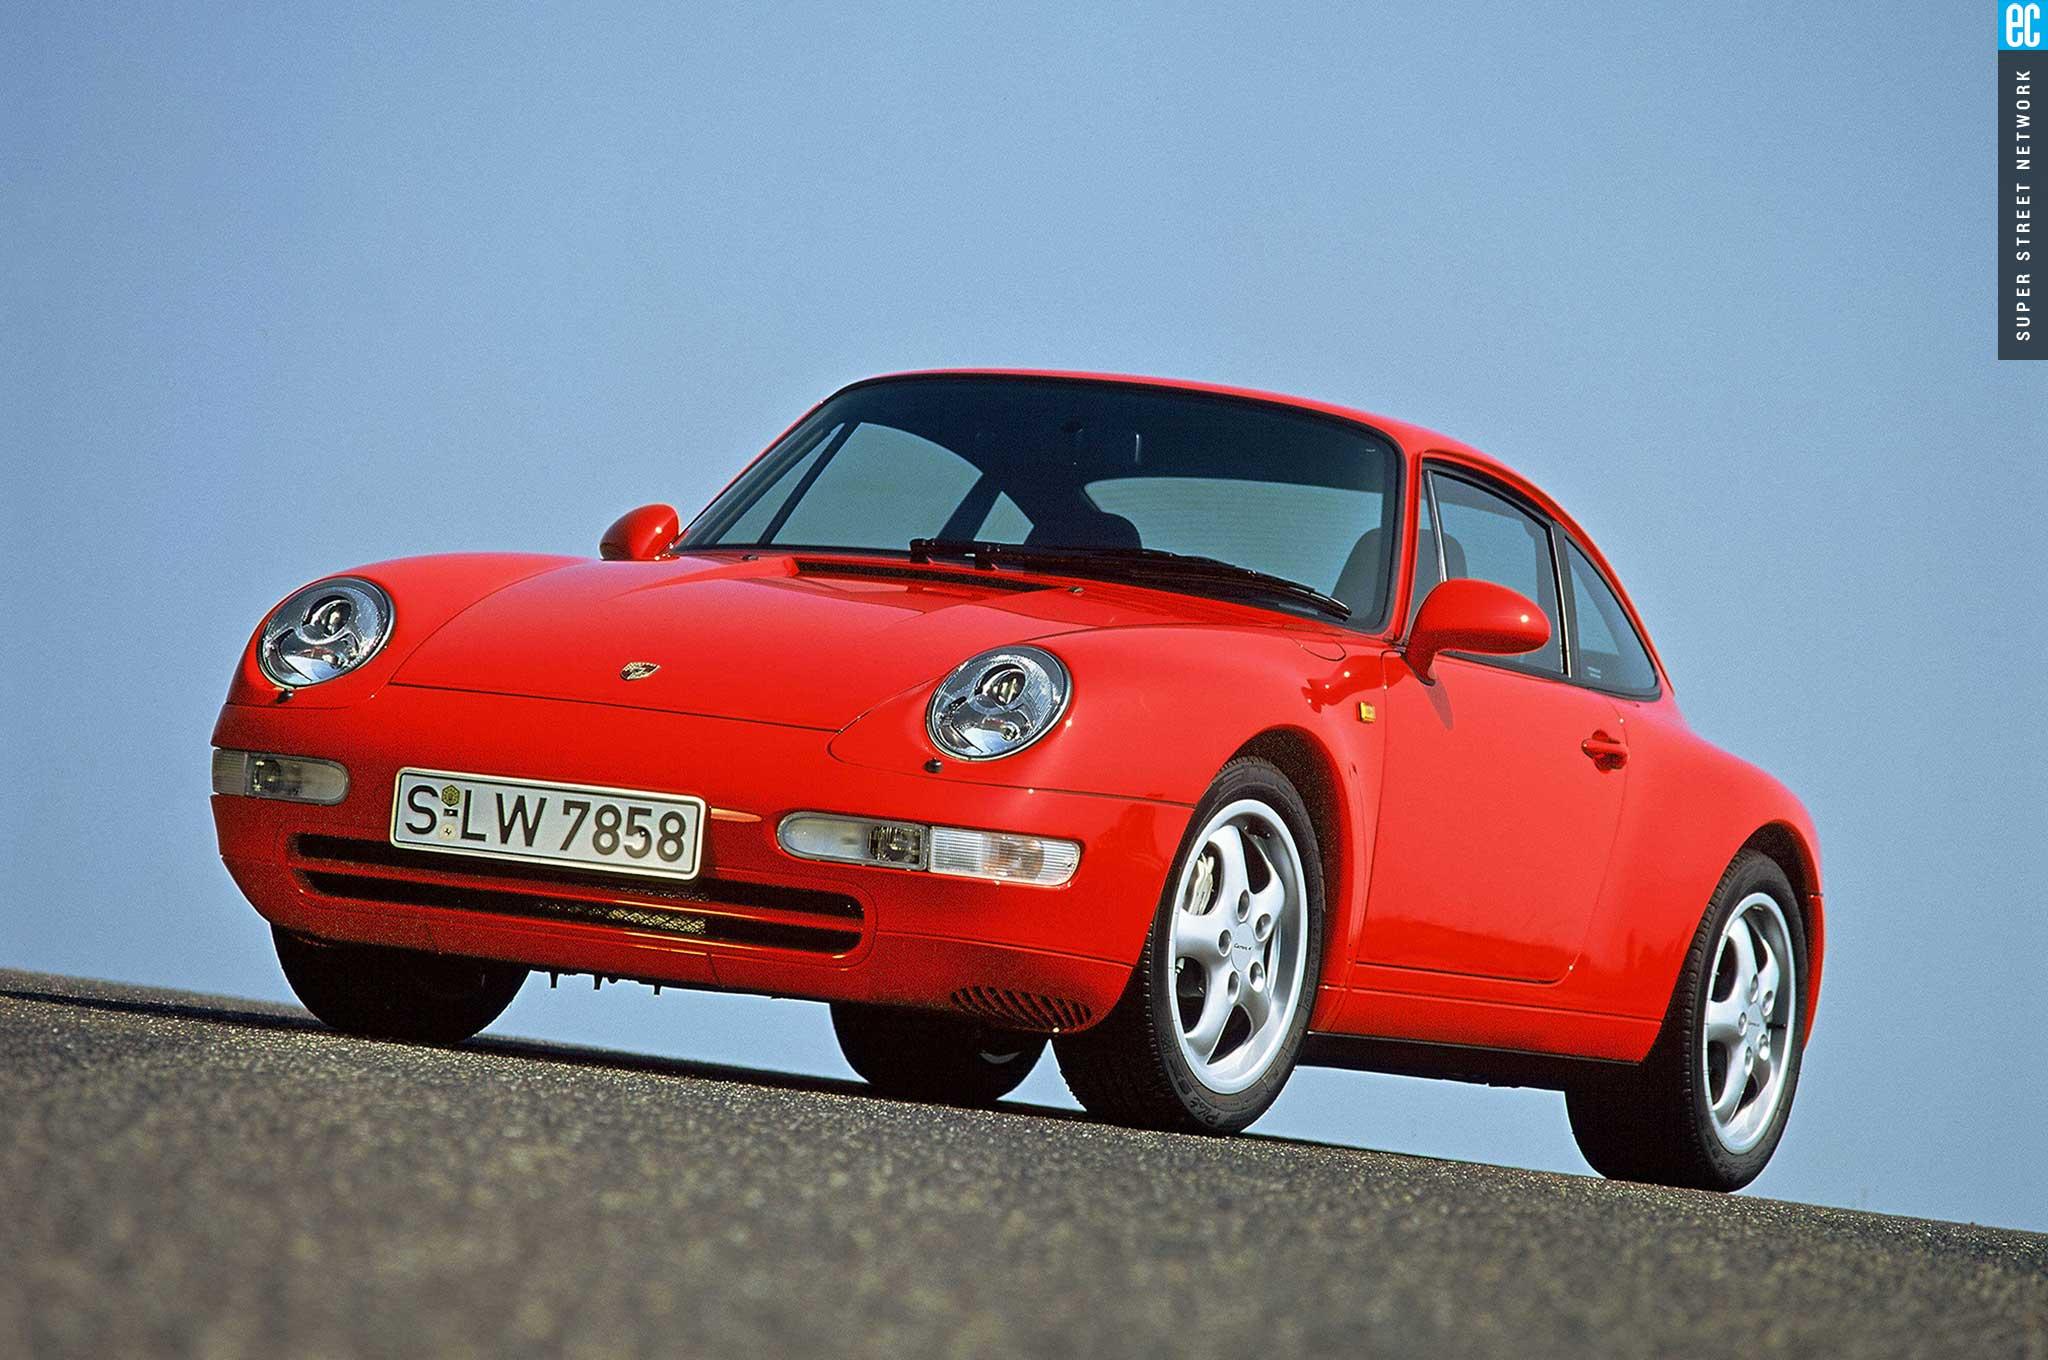 95 98 Porsche 993 Front Bumper